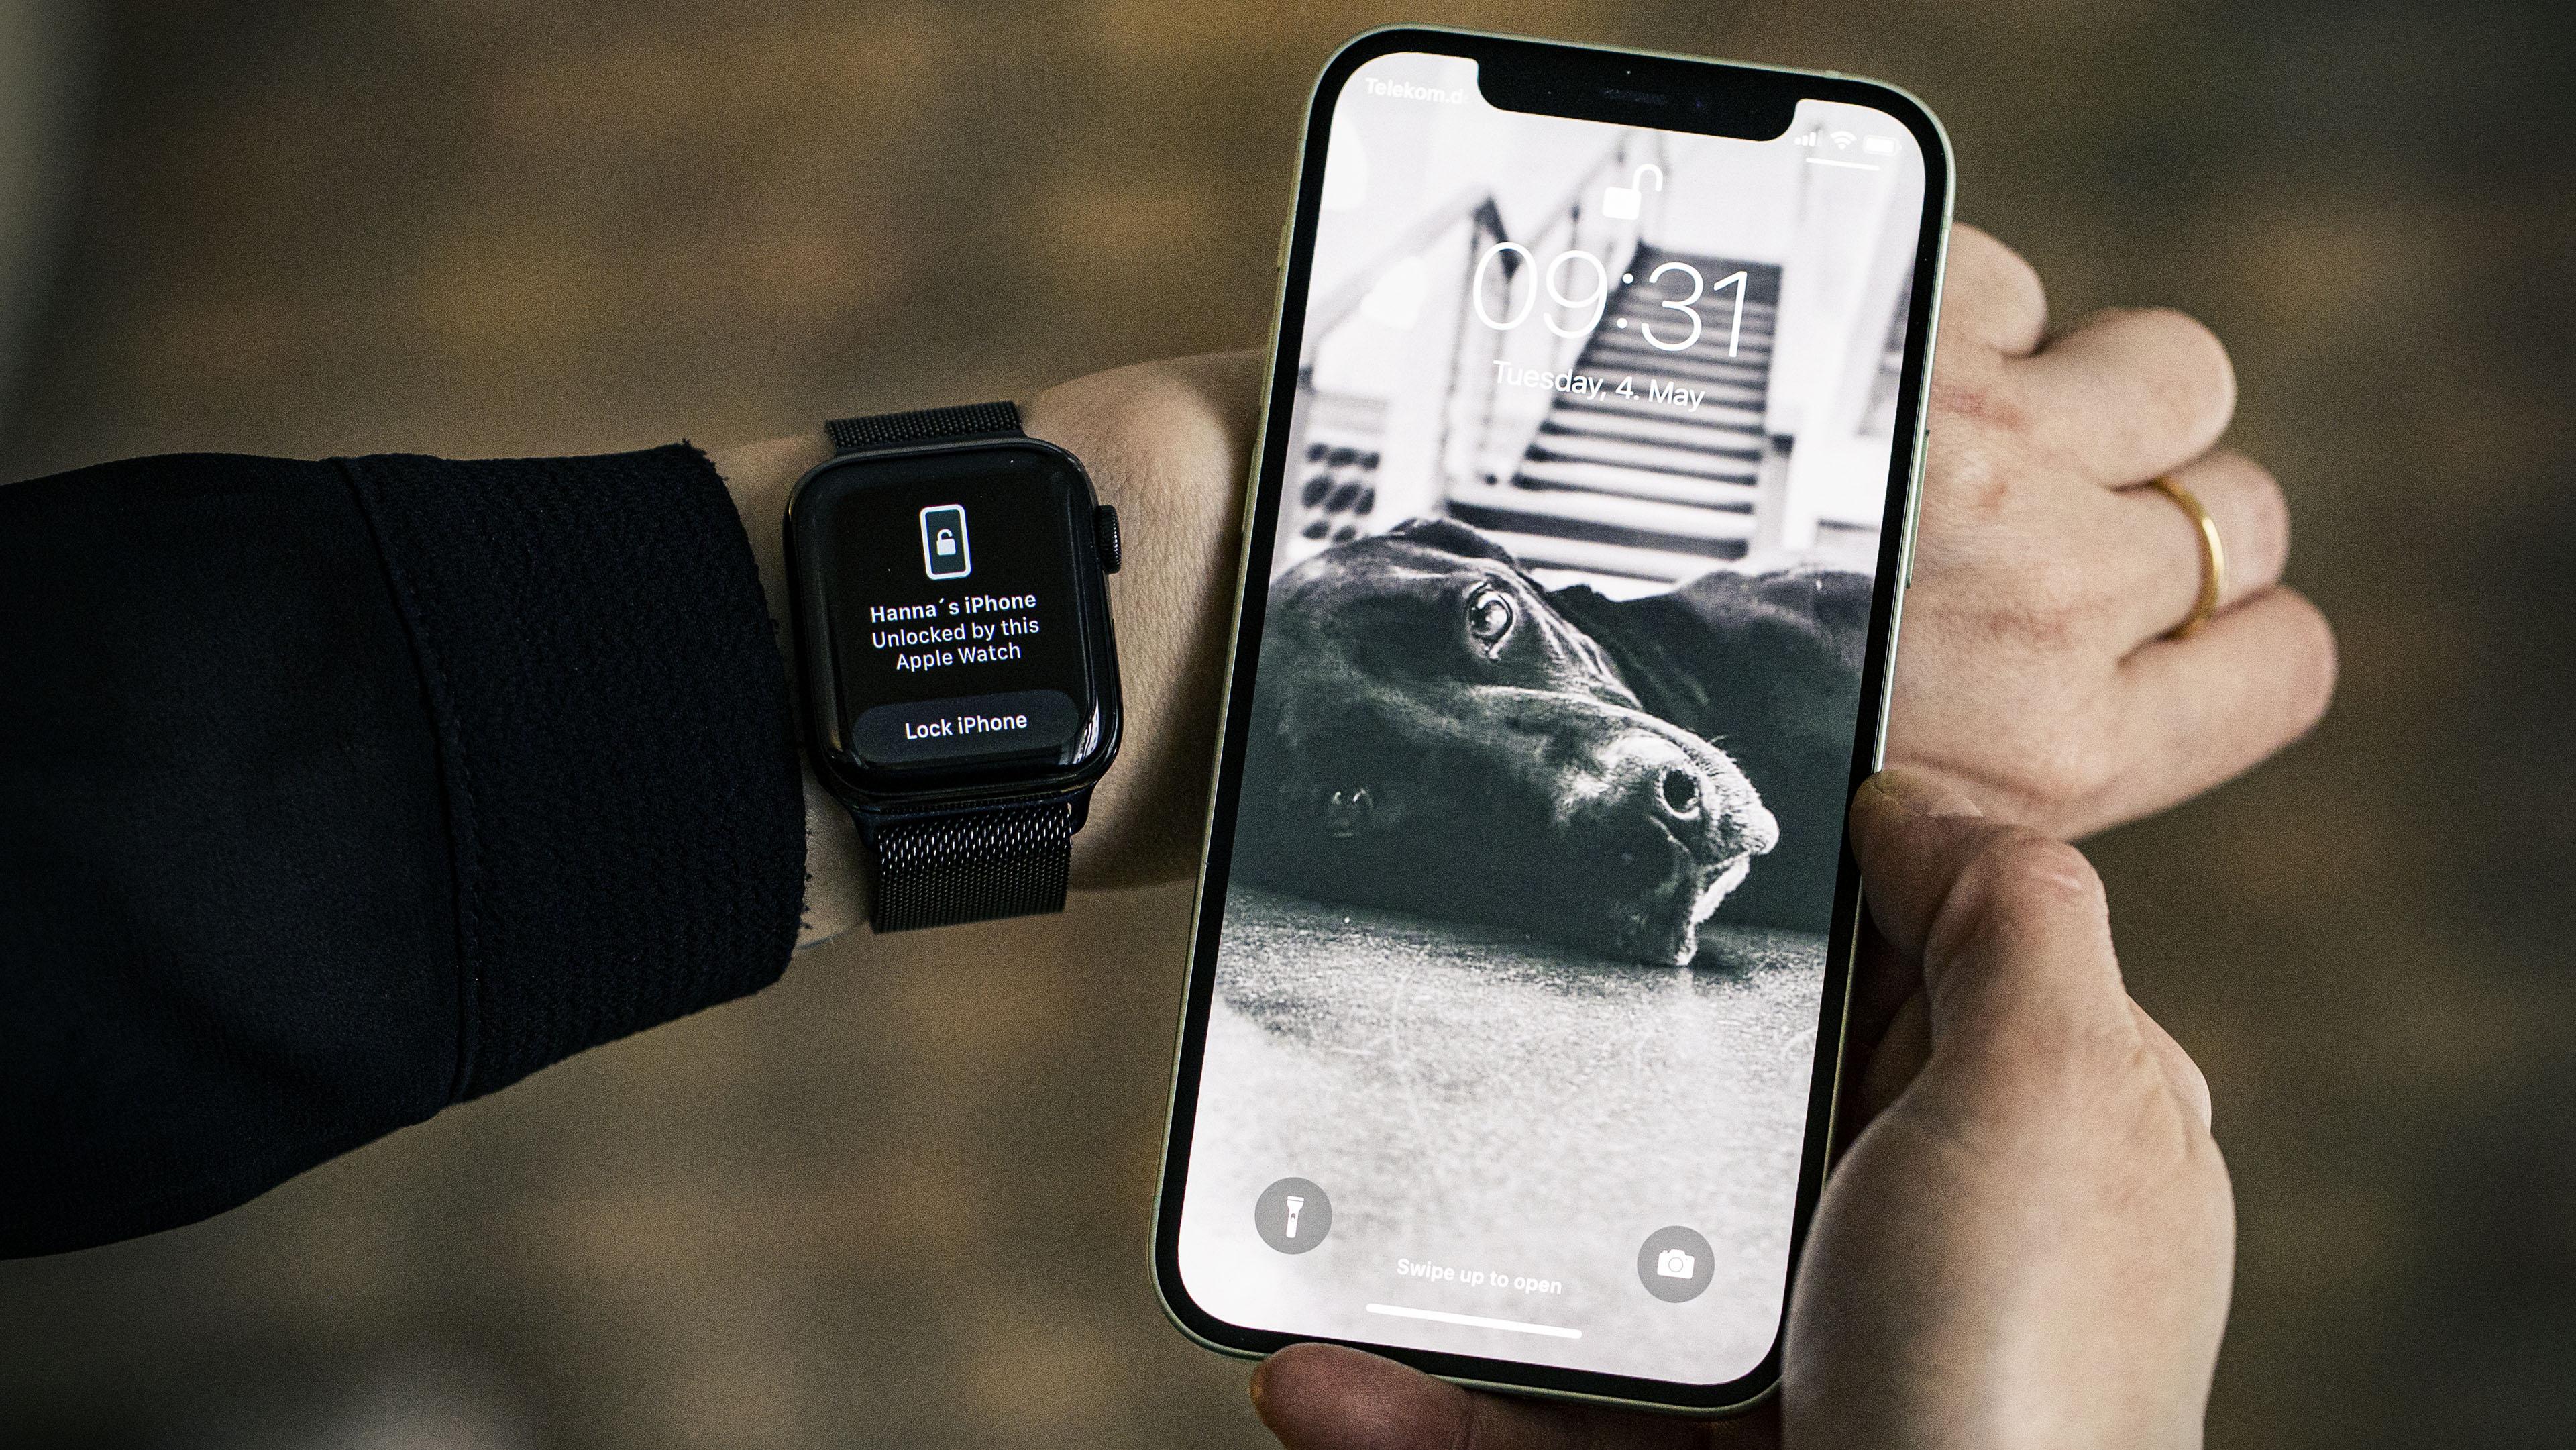 Como desbloquear o iPhone usando o Apple Watch